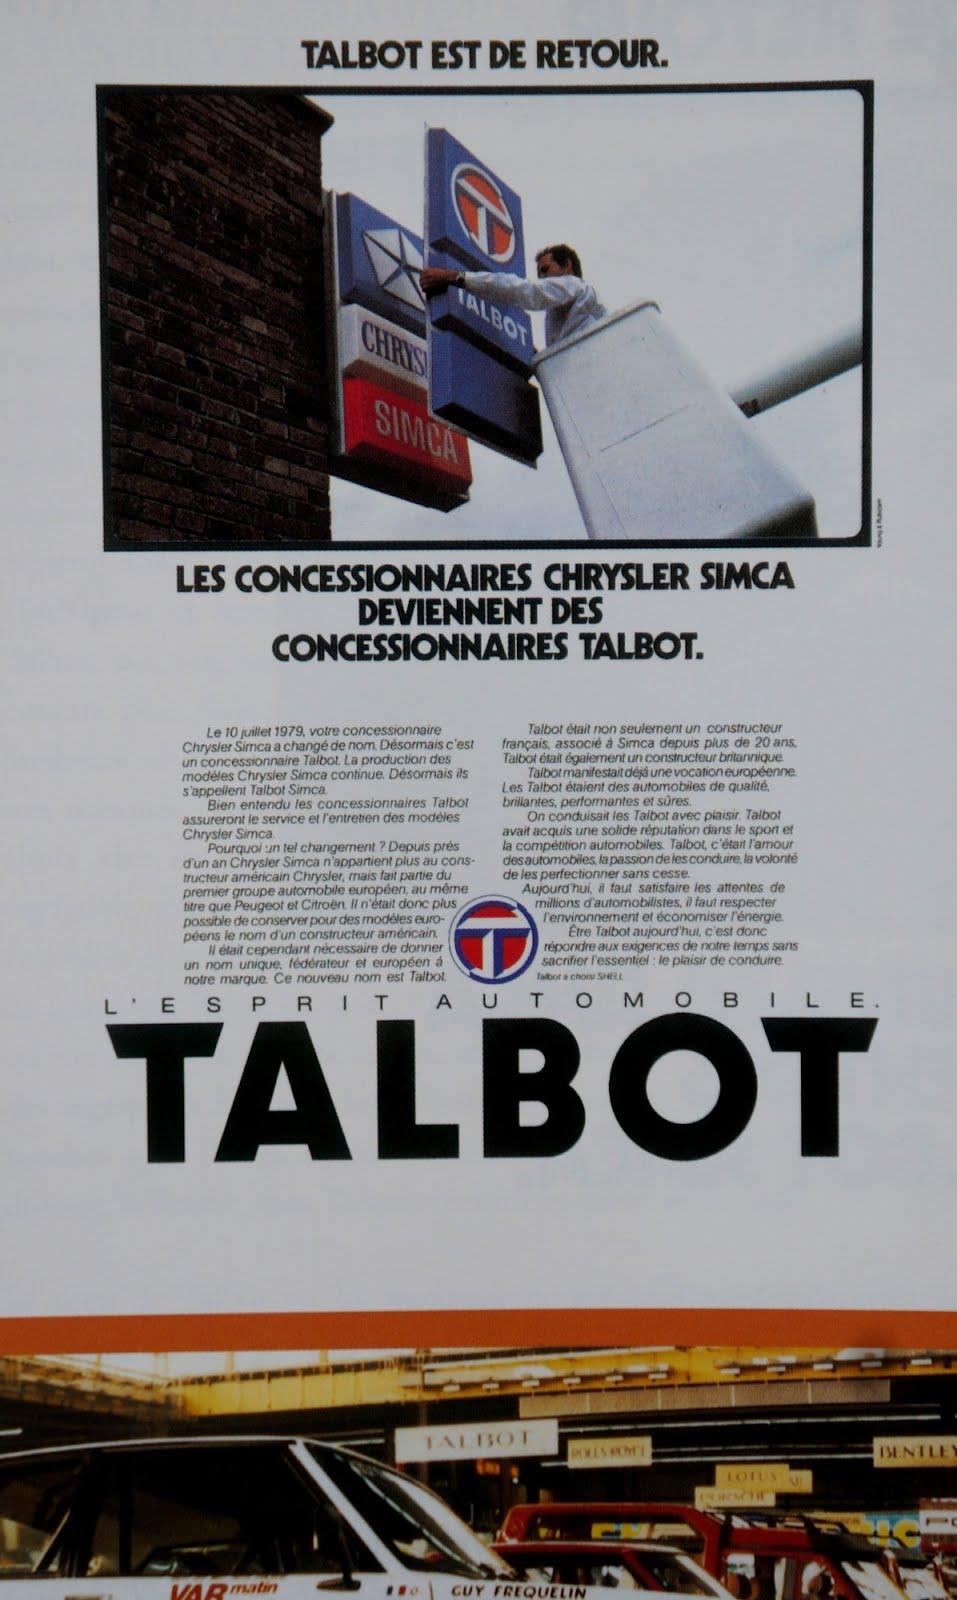 Pub Vintage : Talbot remplace Chrysler